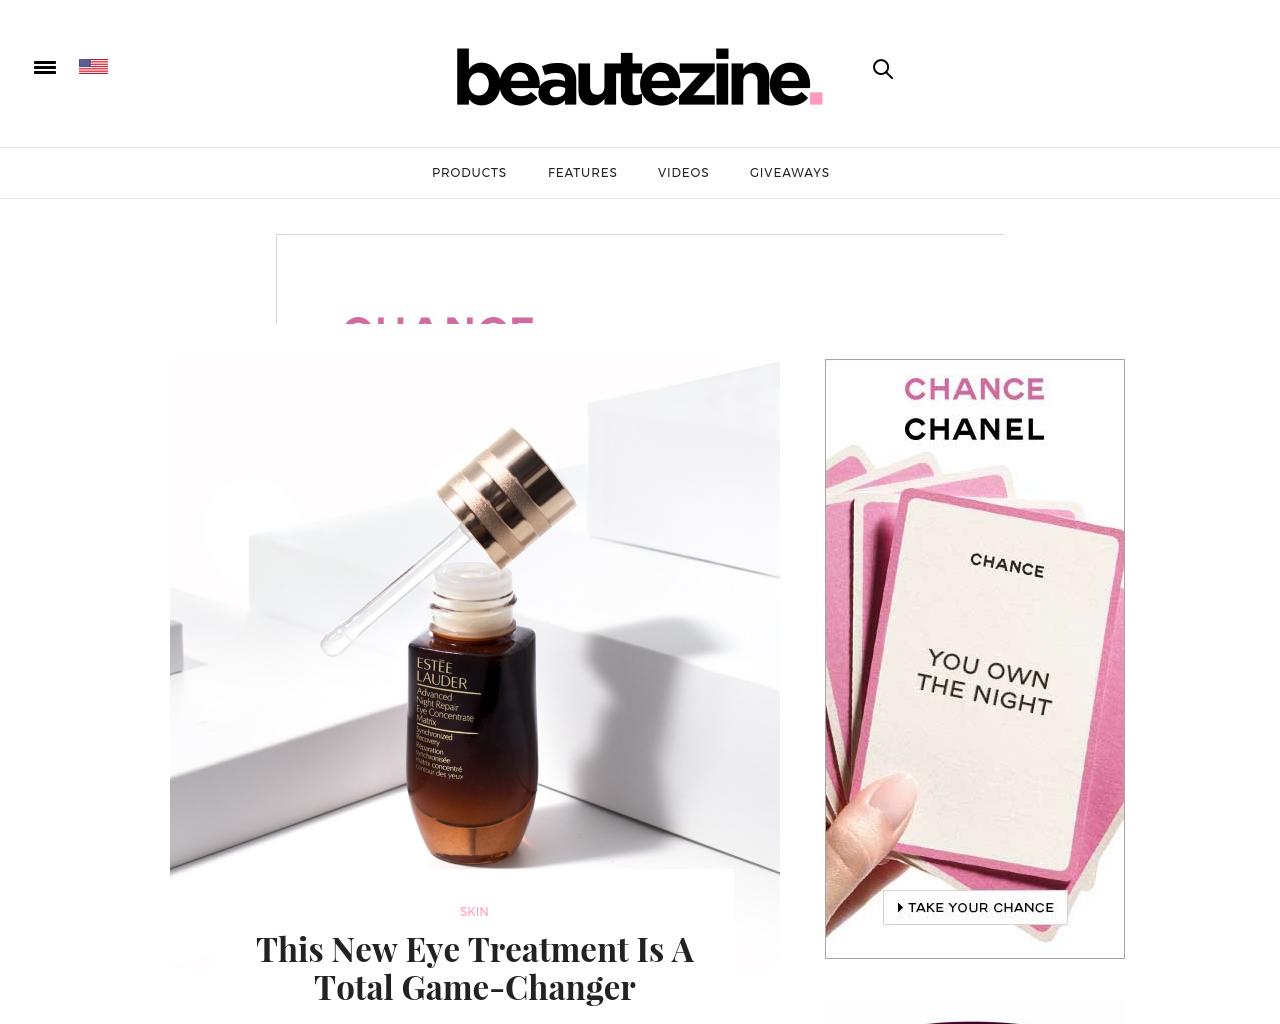 Beautezine-Advertising-Reviews-Pricing